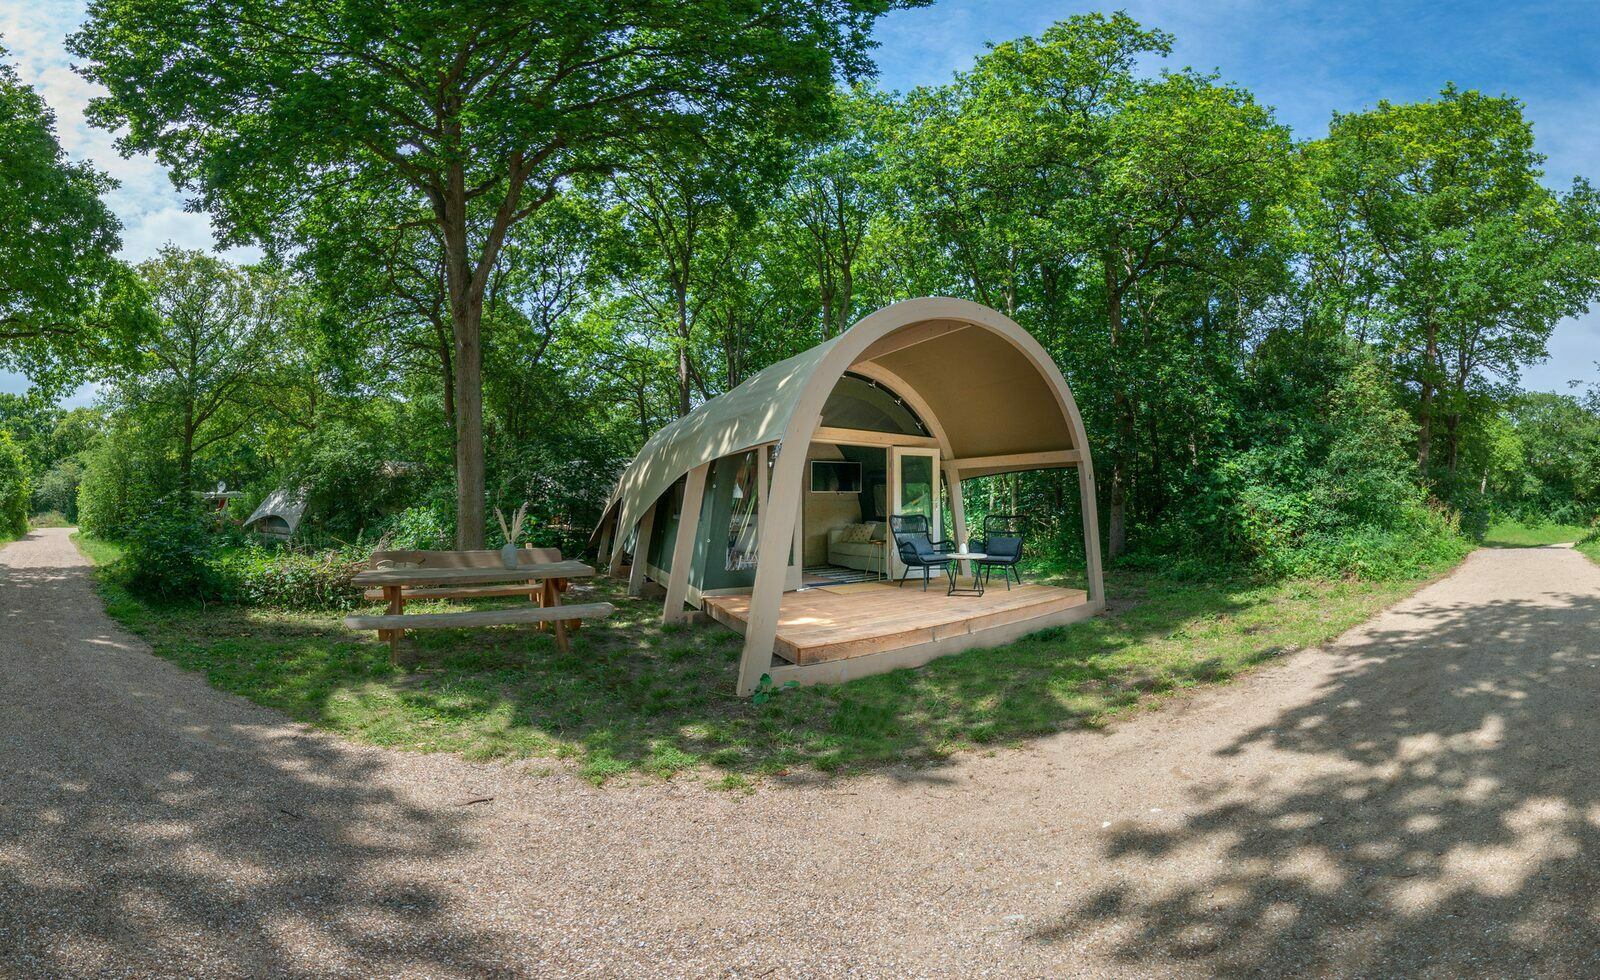 Rent a safari tent in Twente